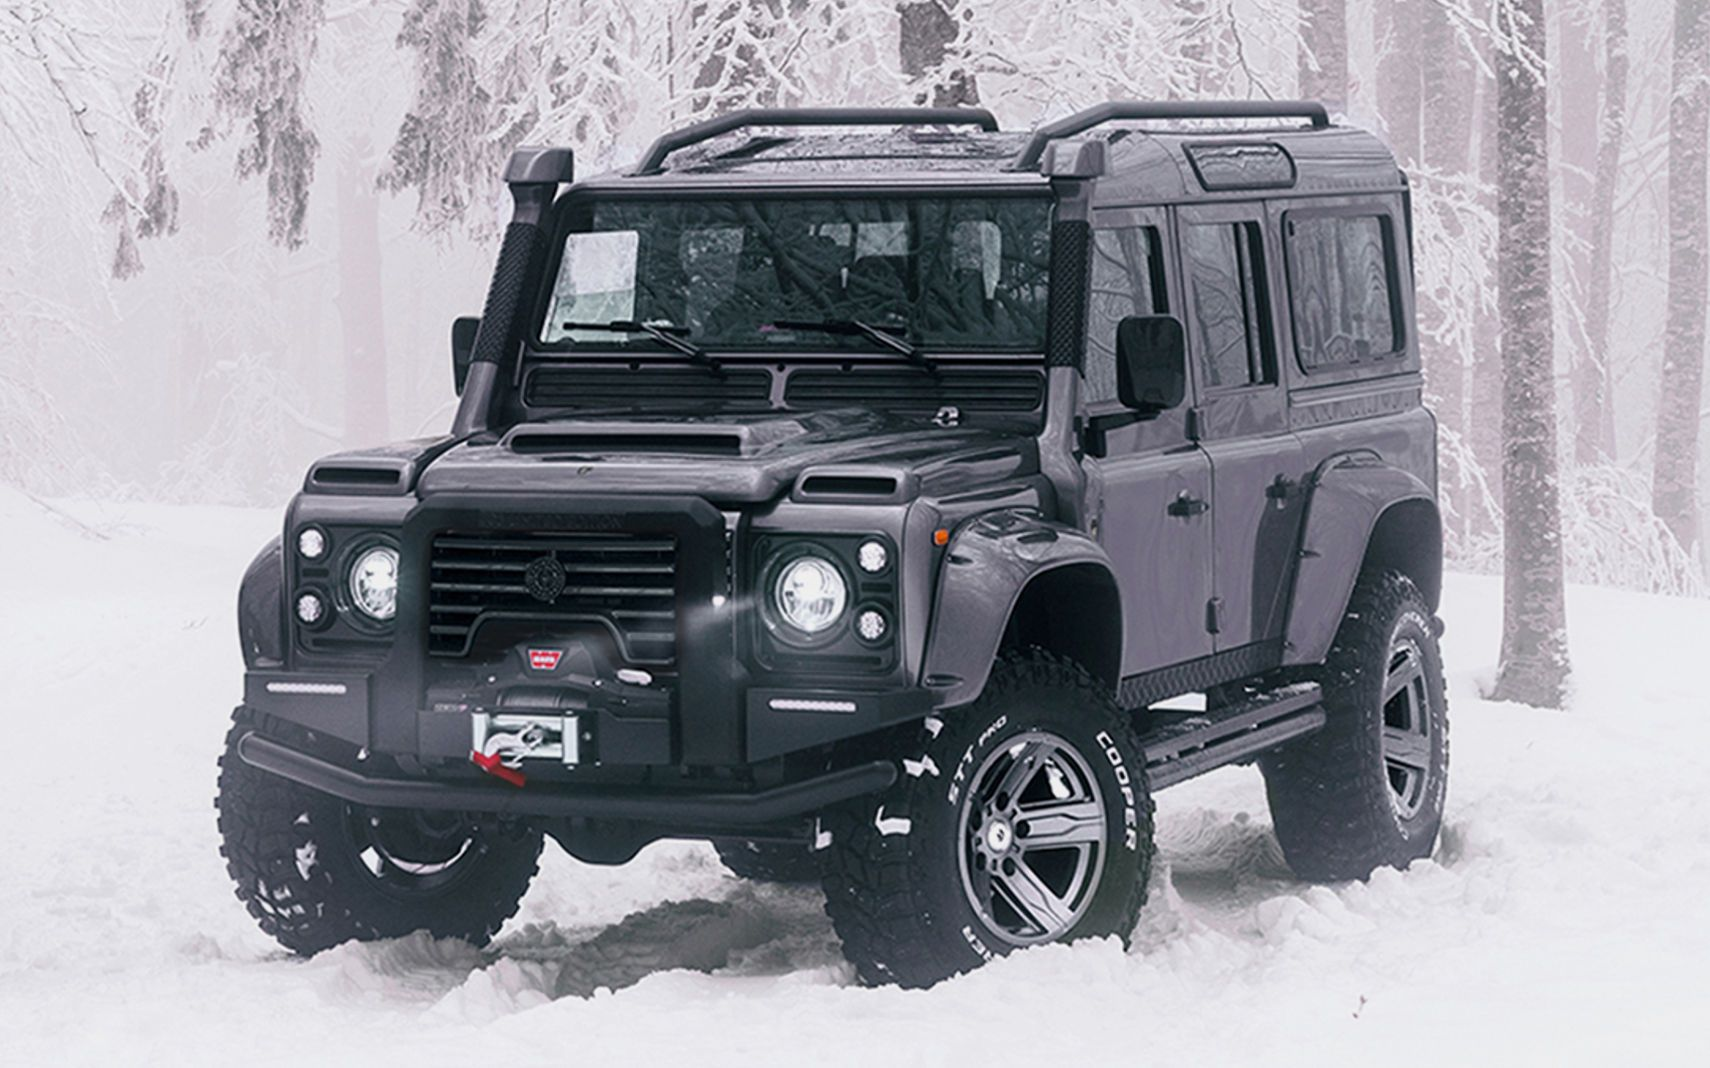 Ares Land Rover Defender Improb Land Rover Defender Land Rover Pickup Trucks